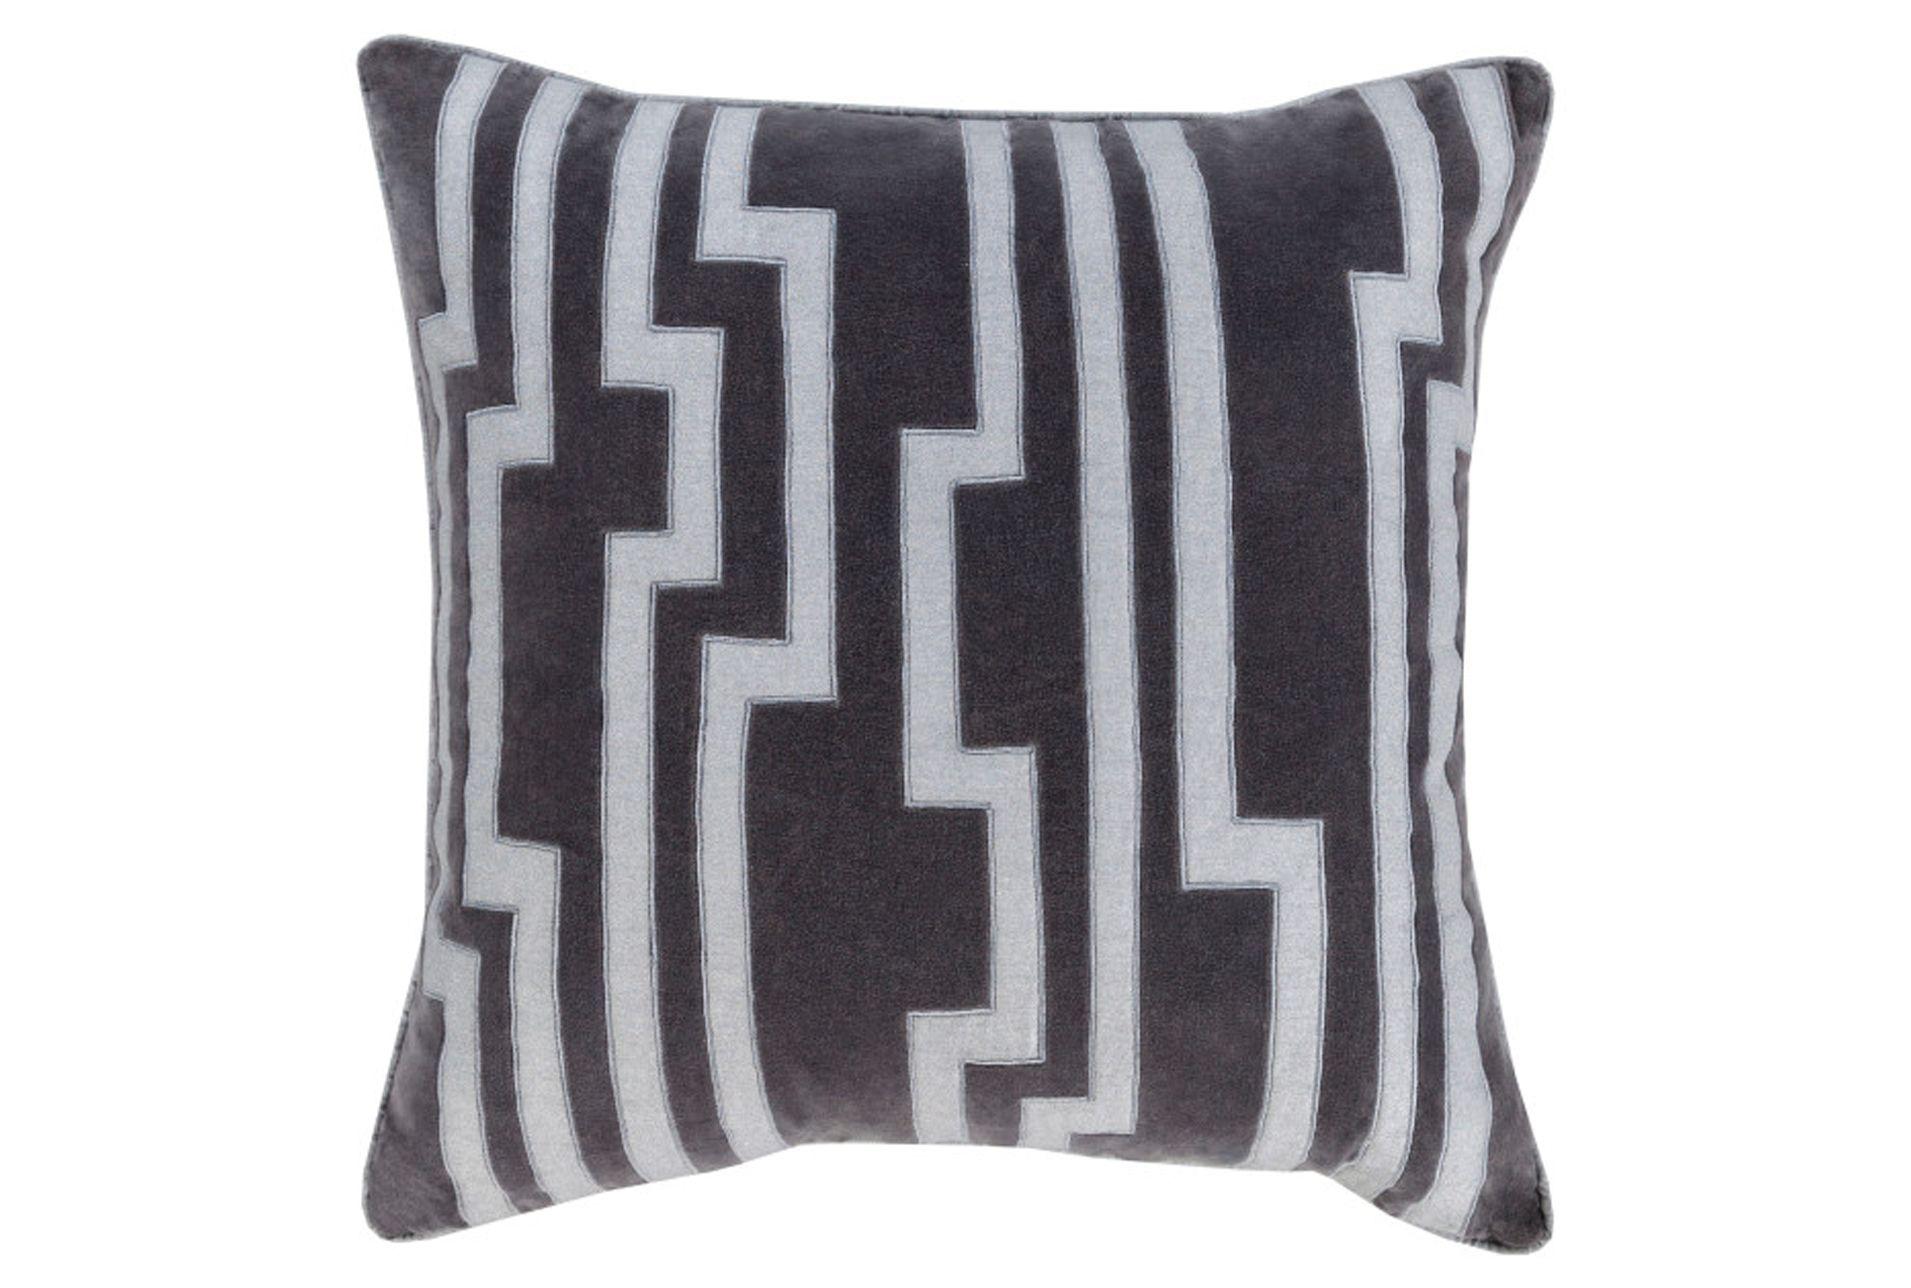 Accent Pillow Avion Geo Grey 20x20 Throw Pillows White Decorative Pillows Geometric Throw Pillows